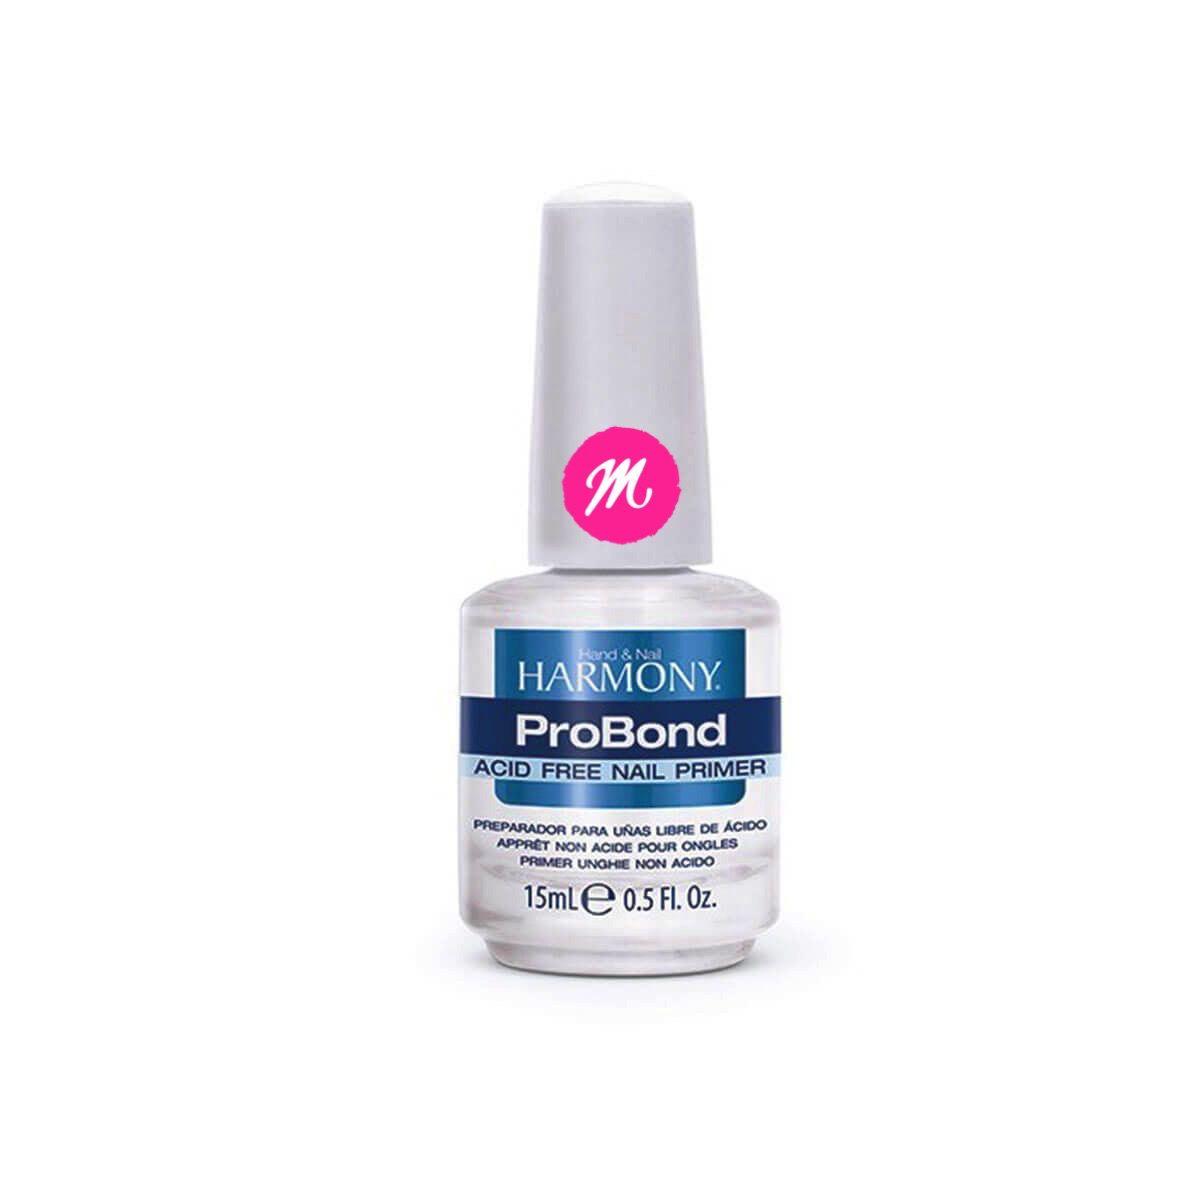 Probond Harmony 13ml + Cuccio Veneer Prep 13ml ( semelhante ao phbond )